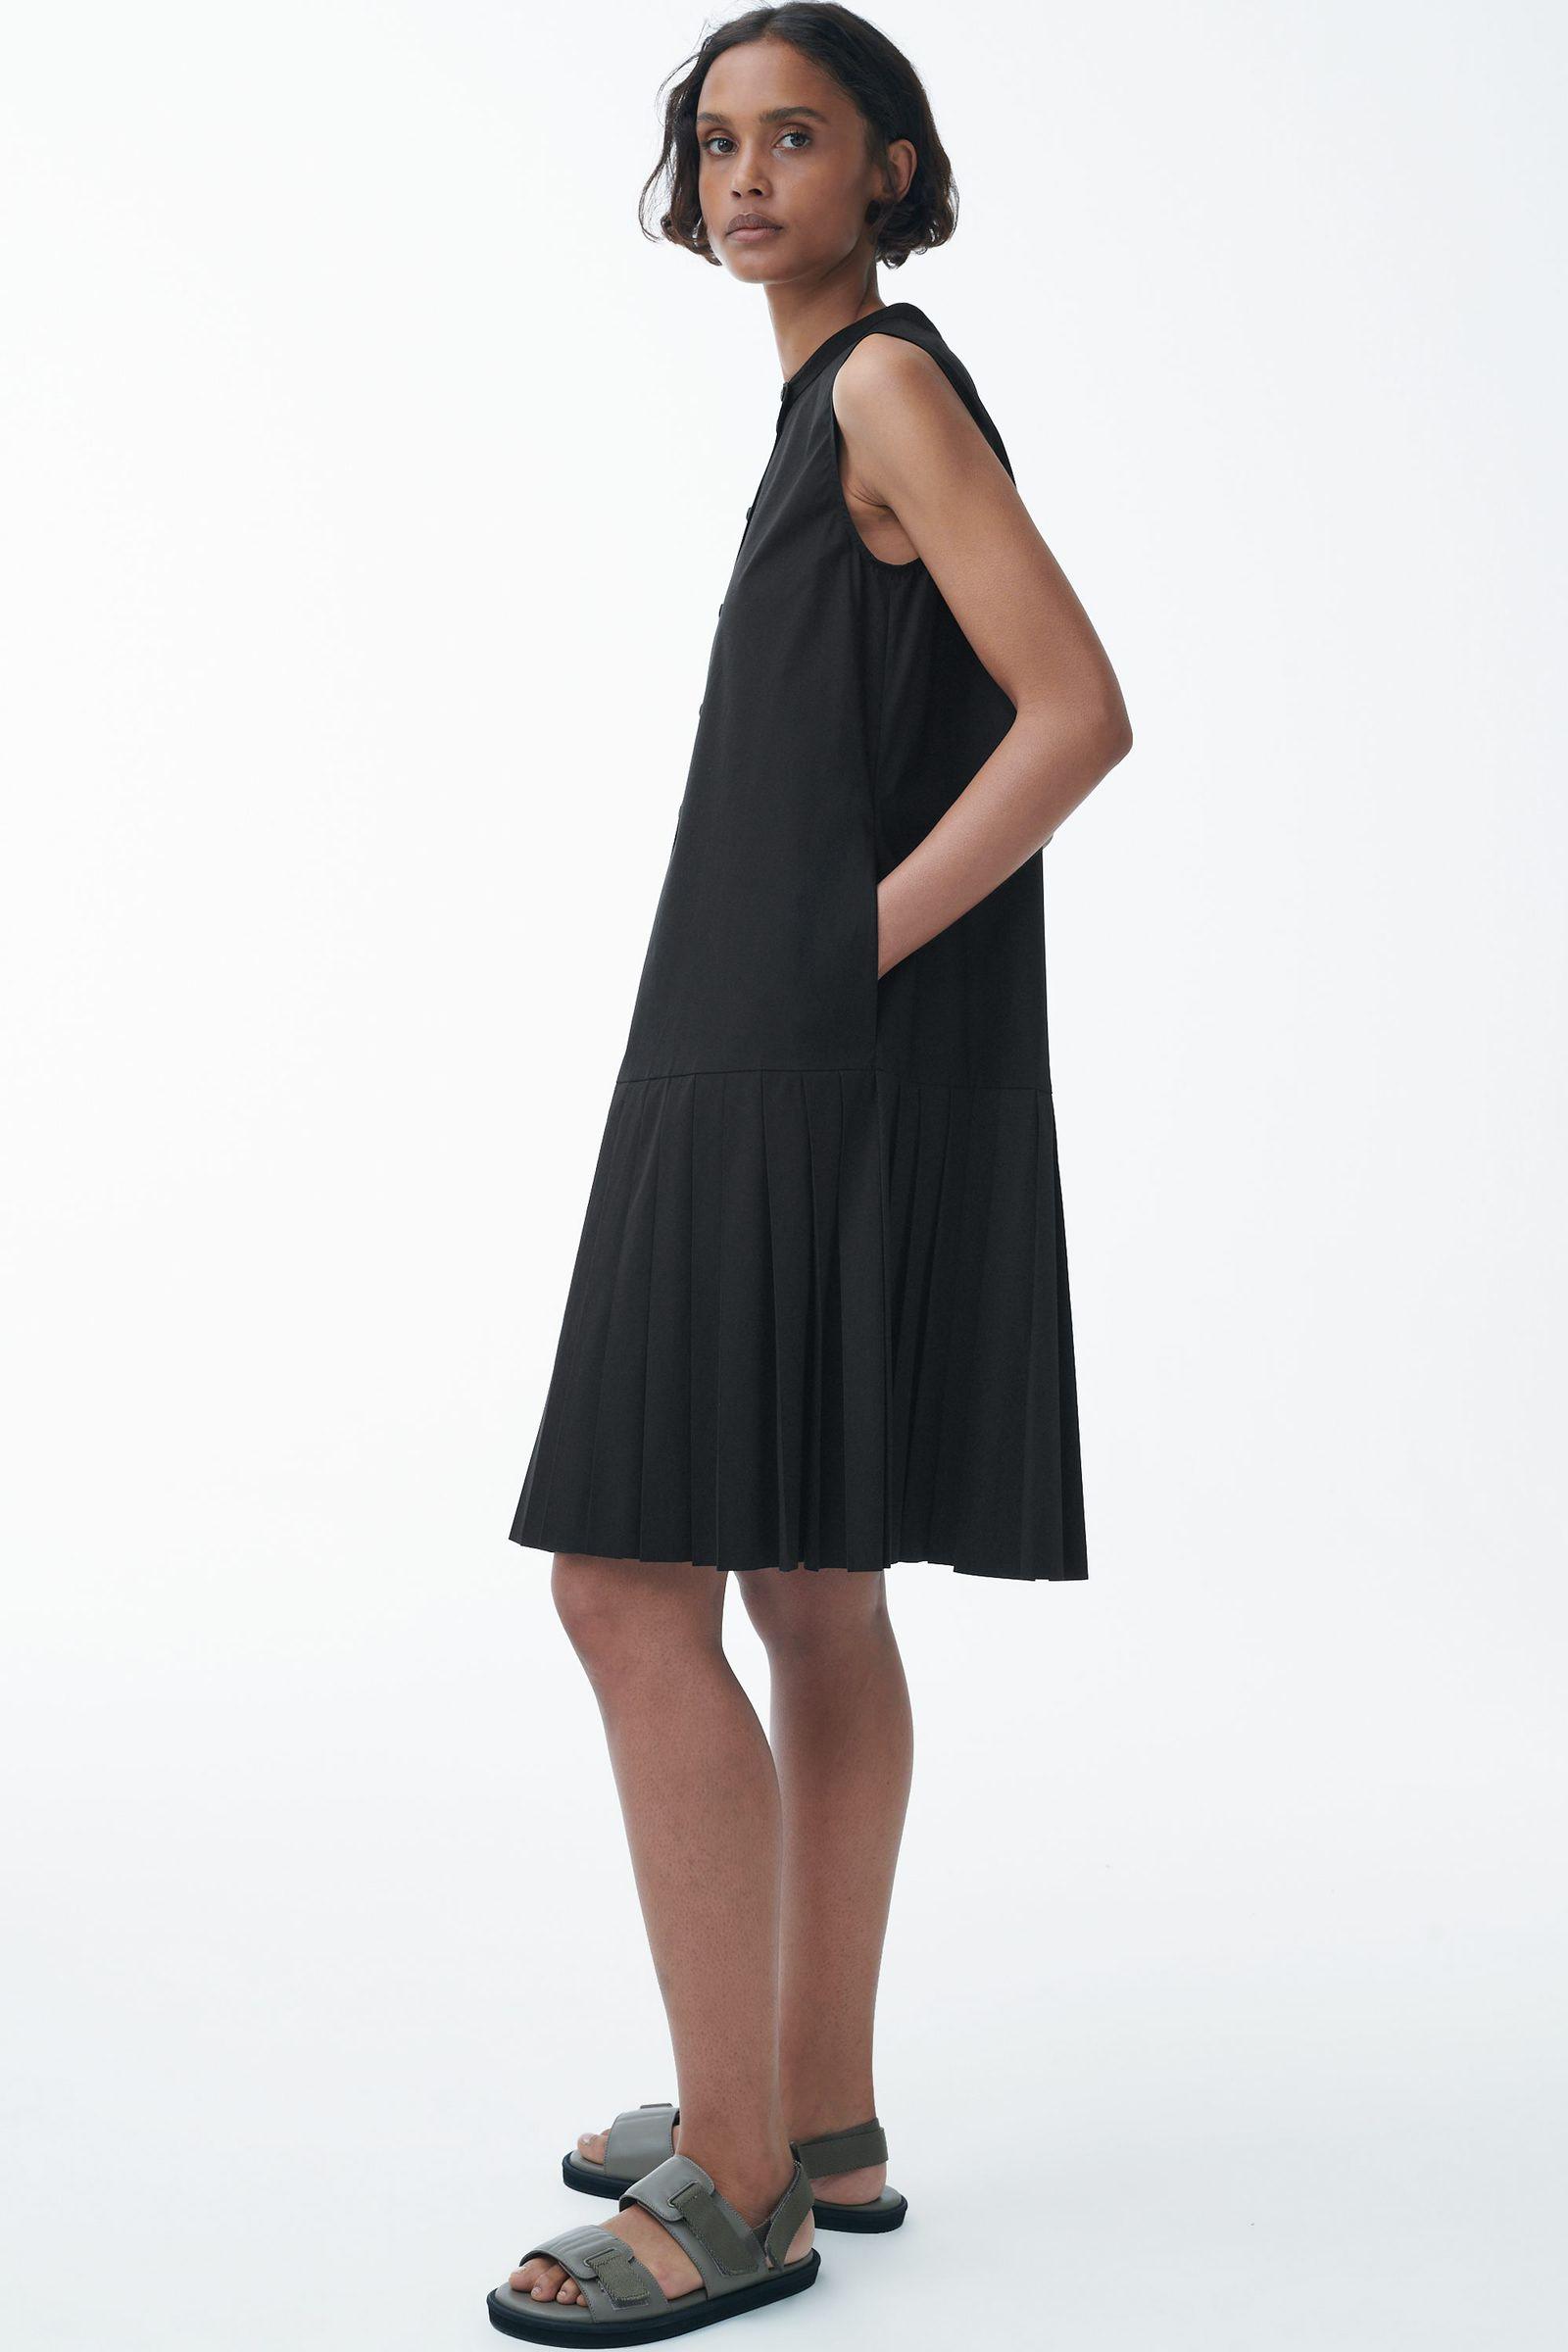 COS 오가닉 코튼 플리츠 패널 드레스의 블랙컬러 ECOMLook입니다.